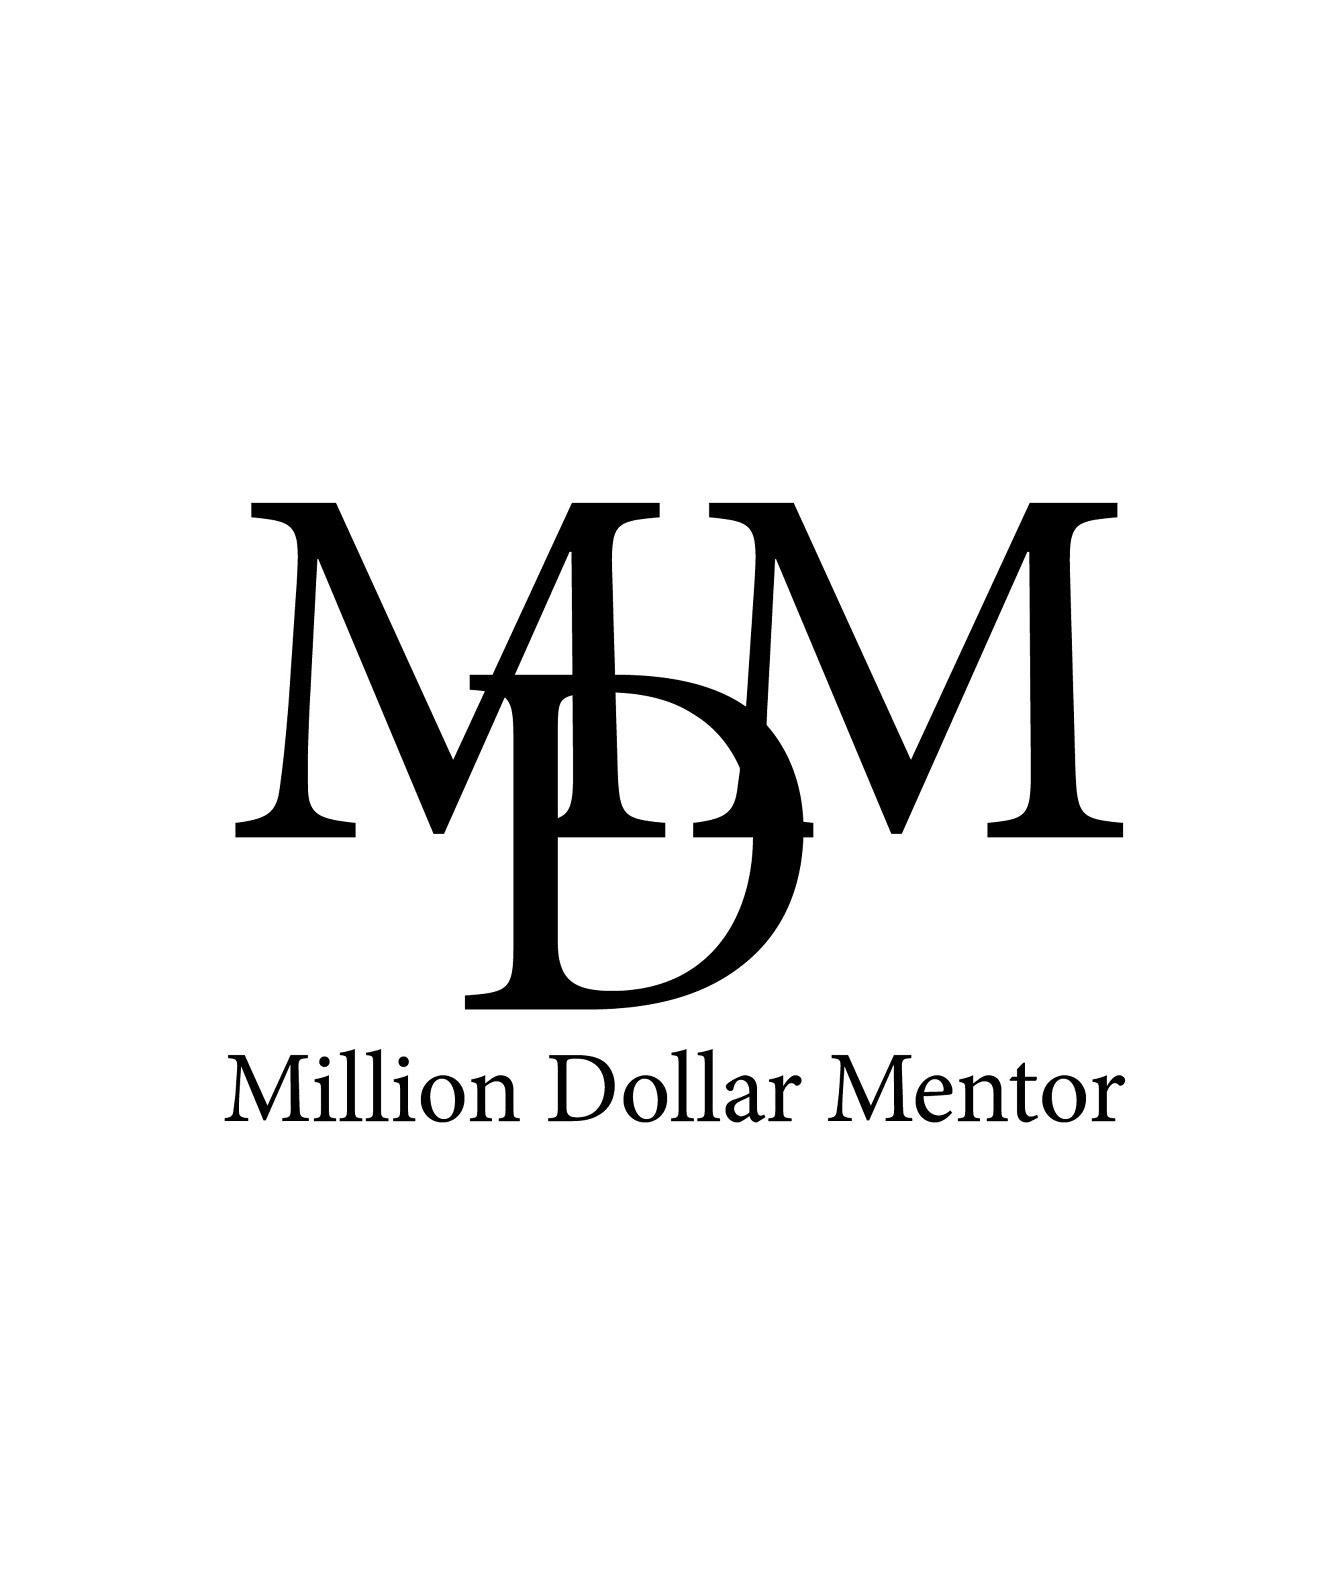 Million Dollar Mentor Logo Design